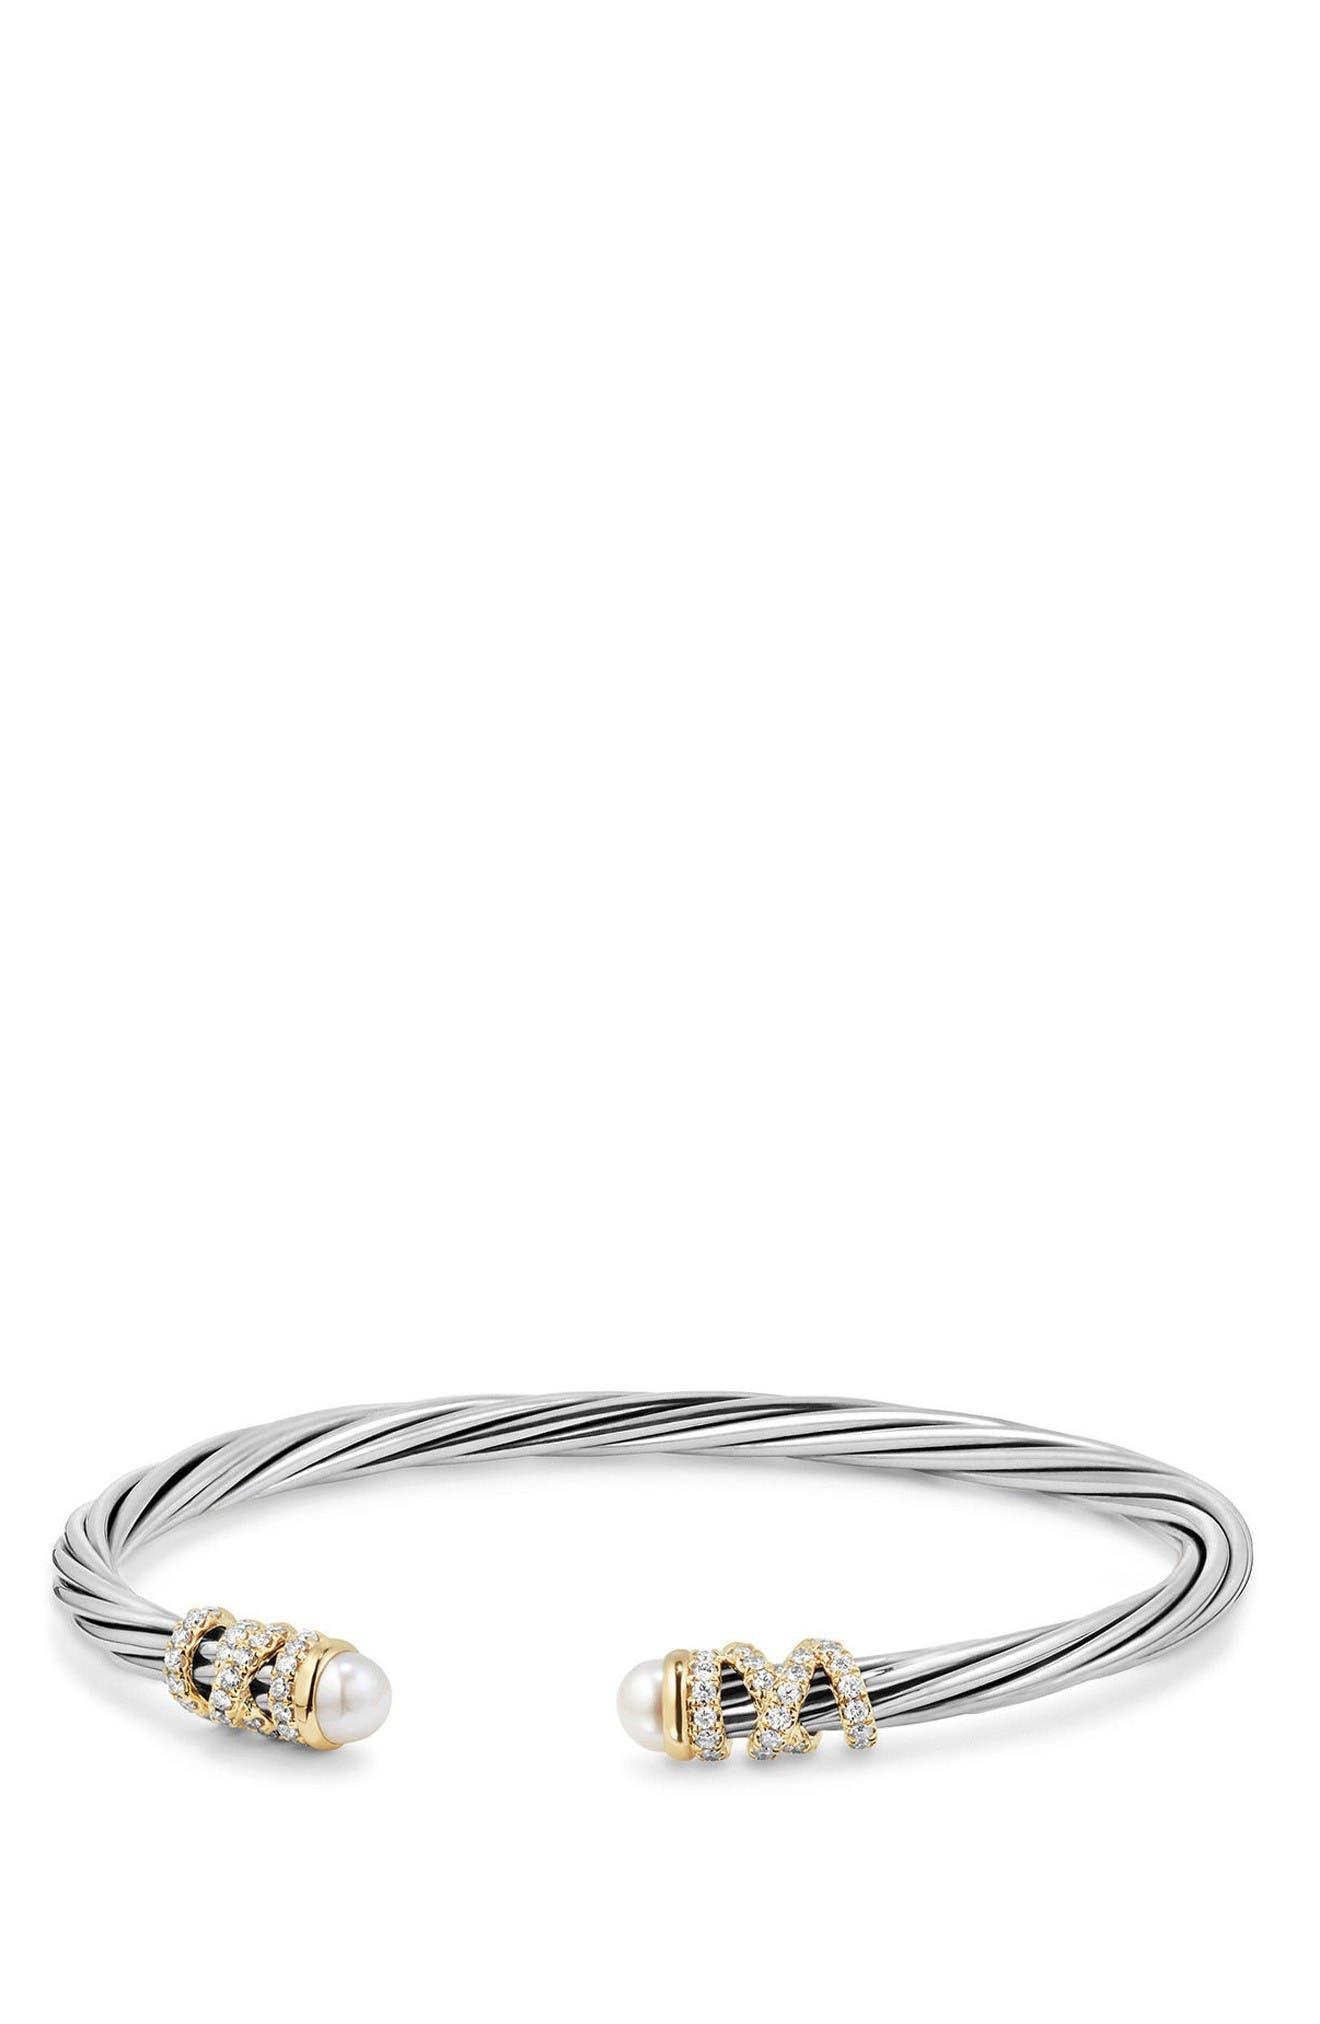 Main Image - David Yurman Helena End Station Bracelet with Pearls & Diamonds, 4mm